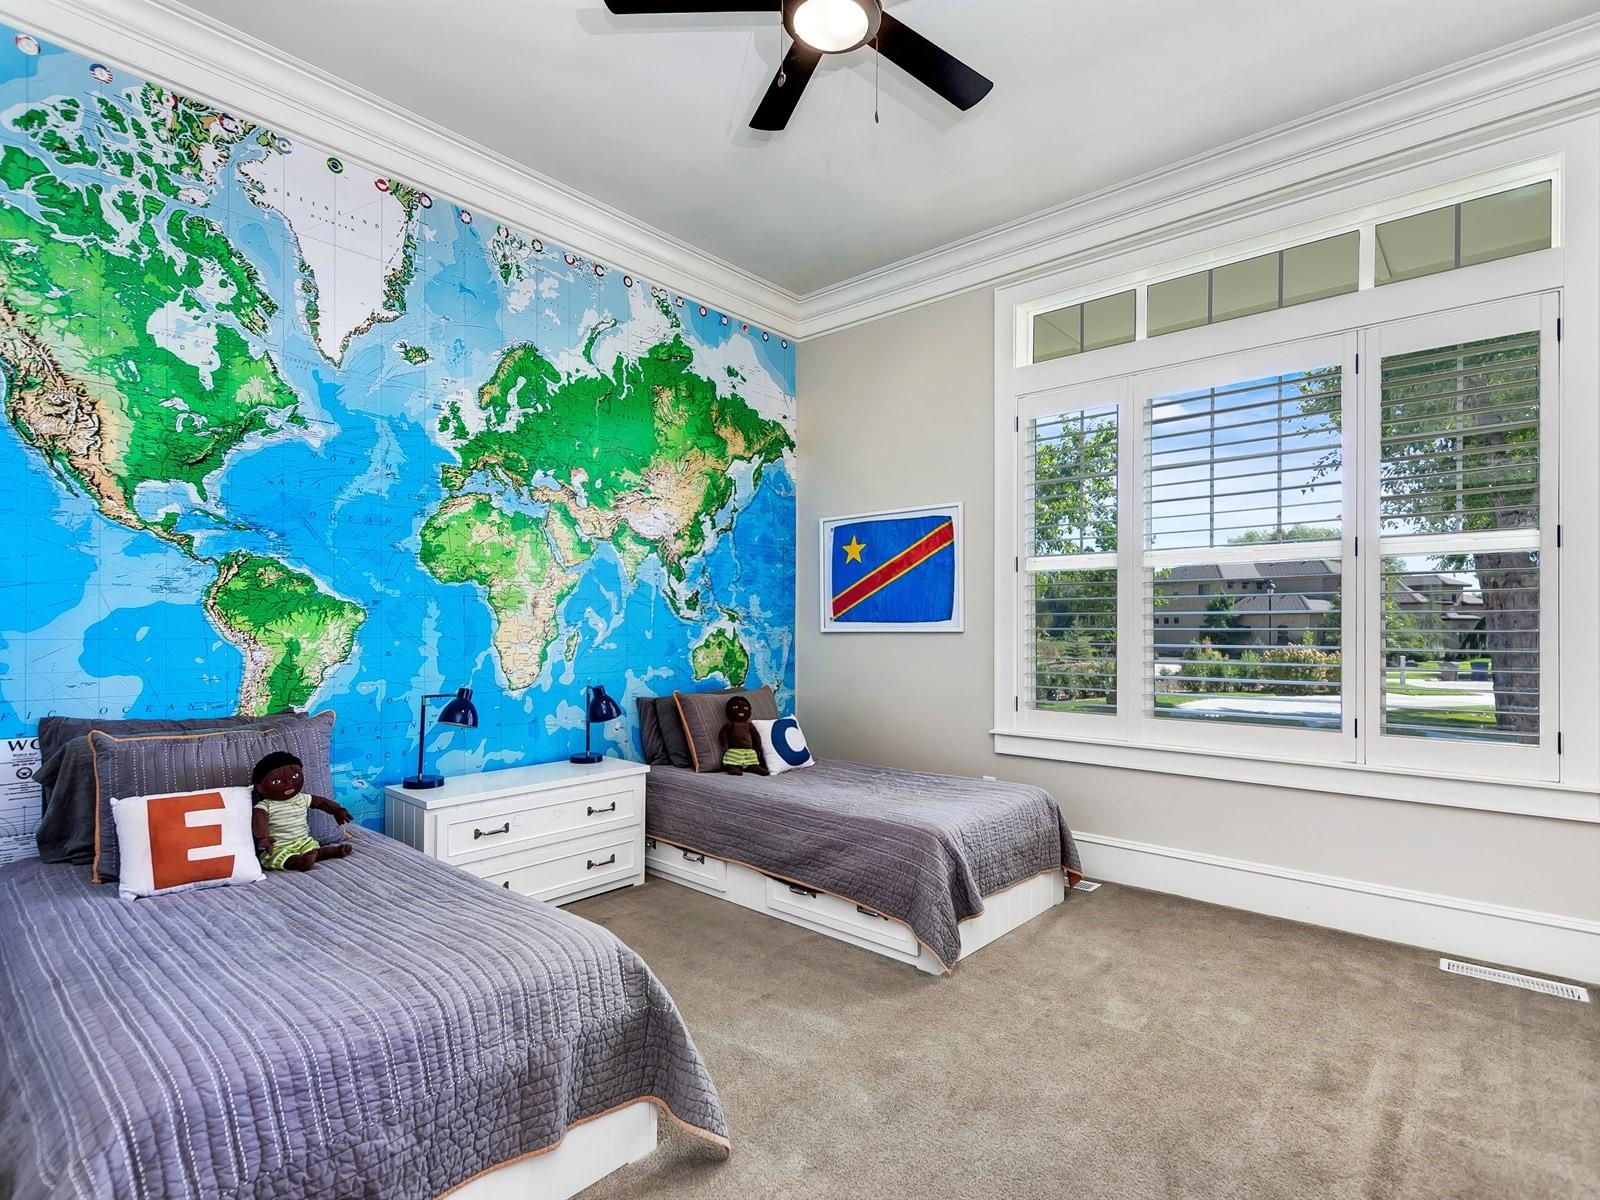 030_Bedroom .jpg